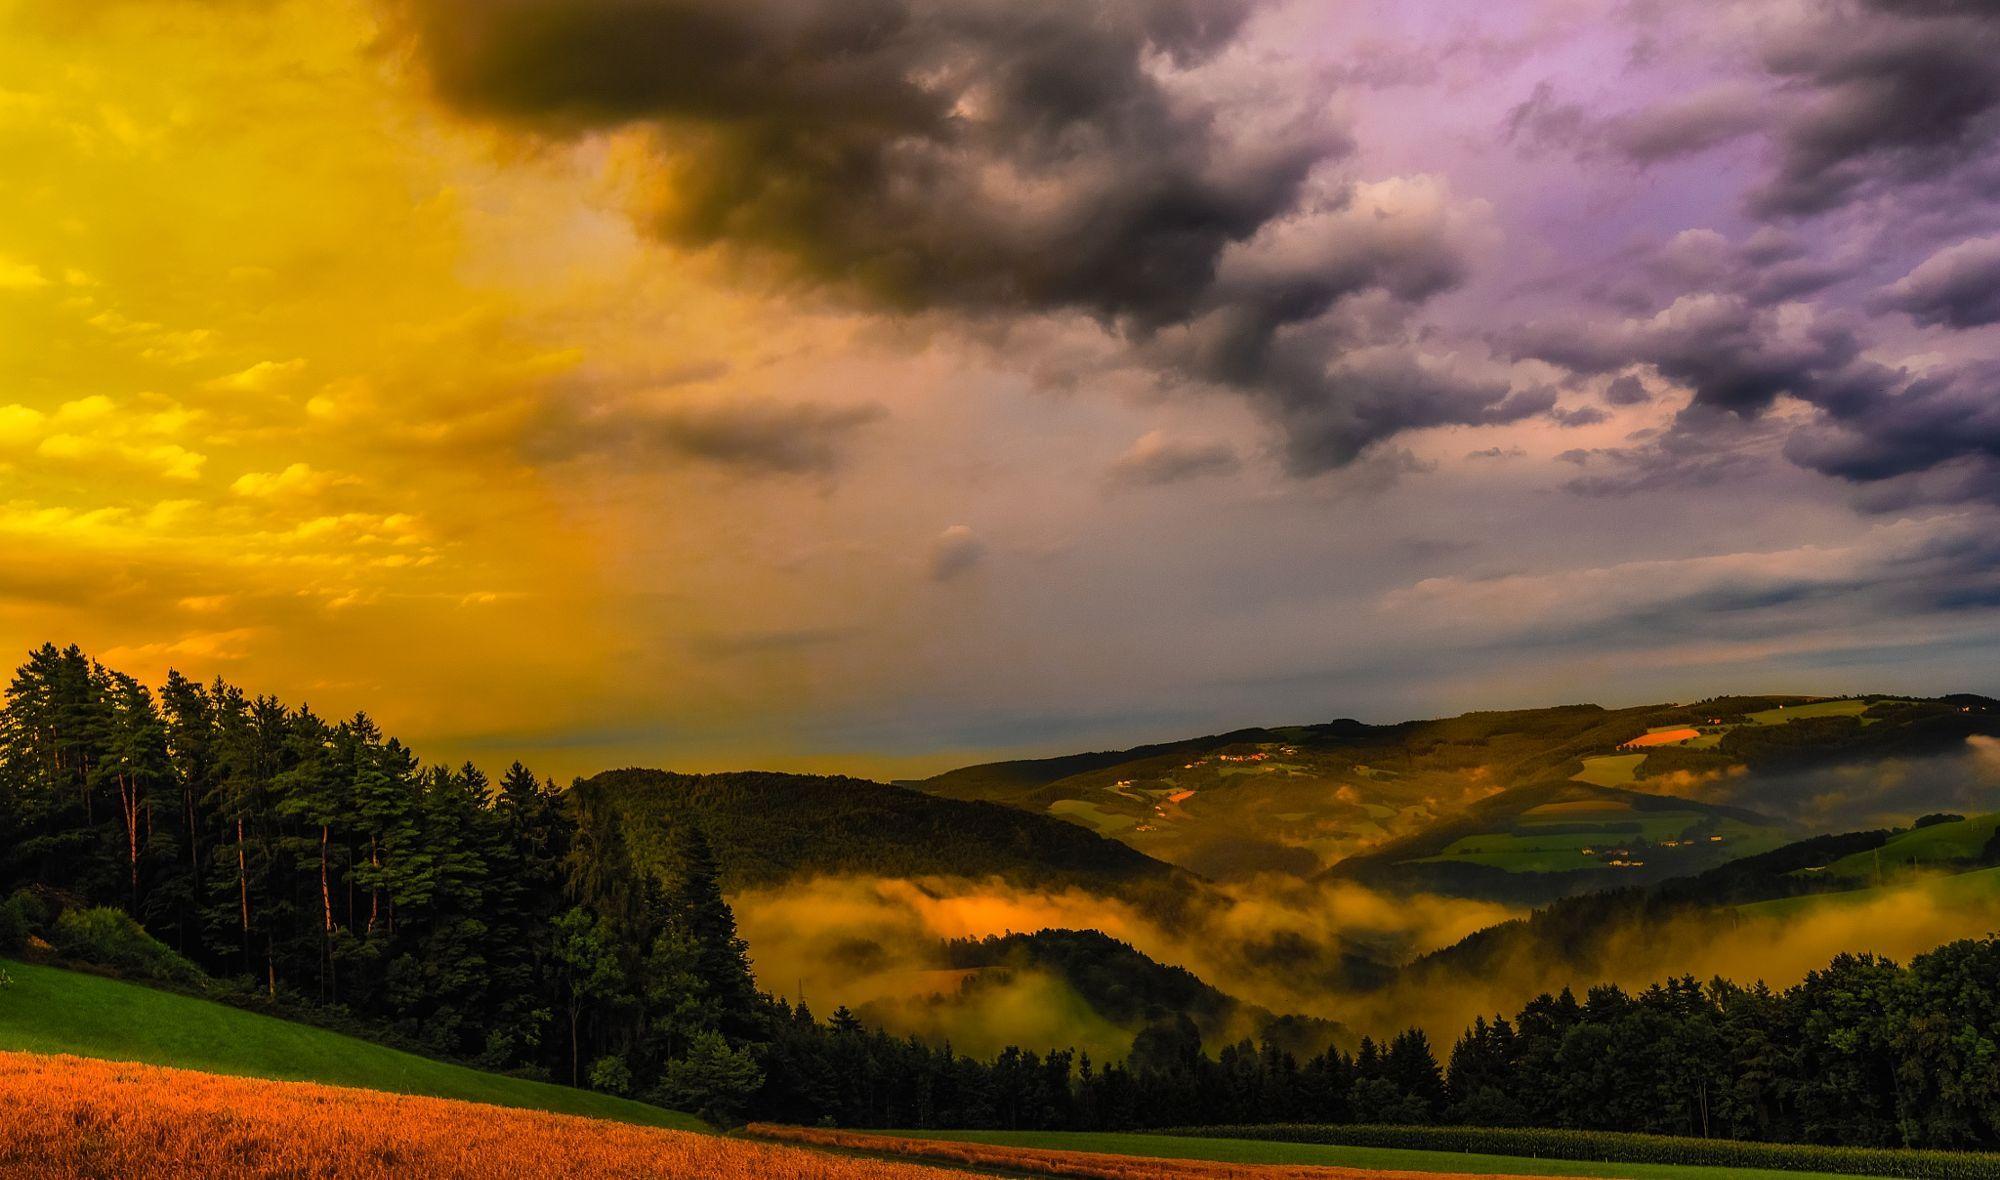 Good Evening  Landscapes photo by olafholland http://rarme.com/?F9gZi